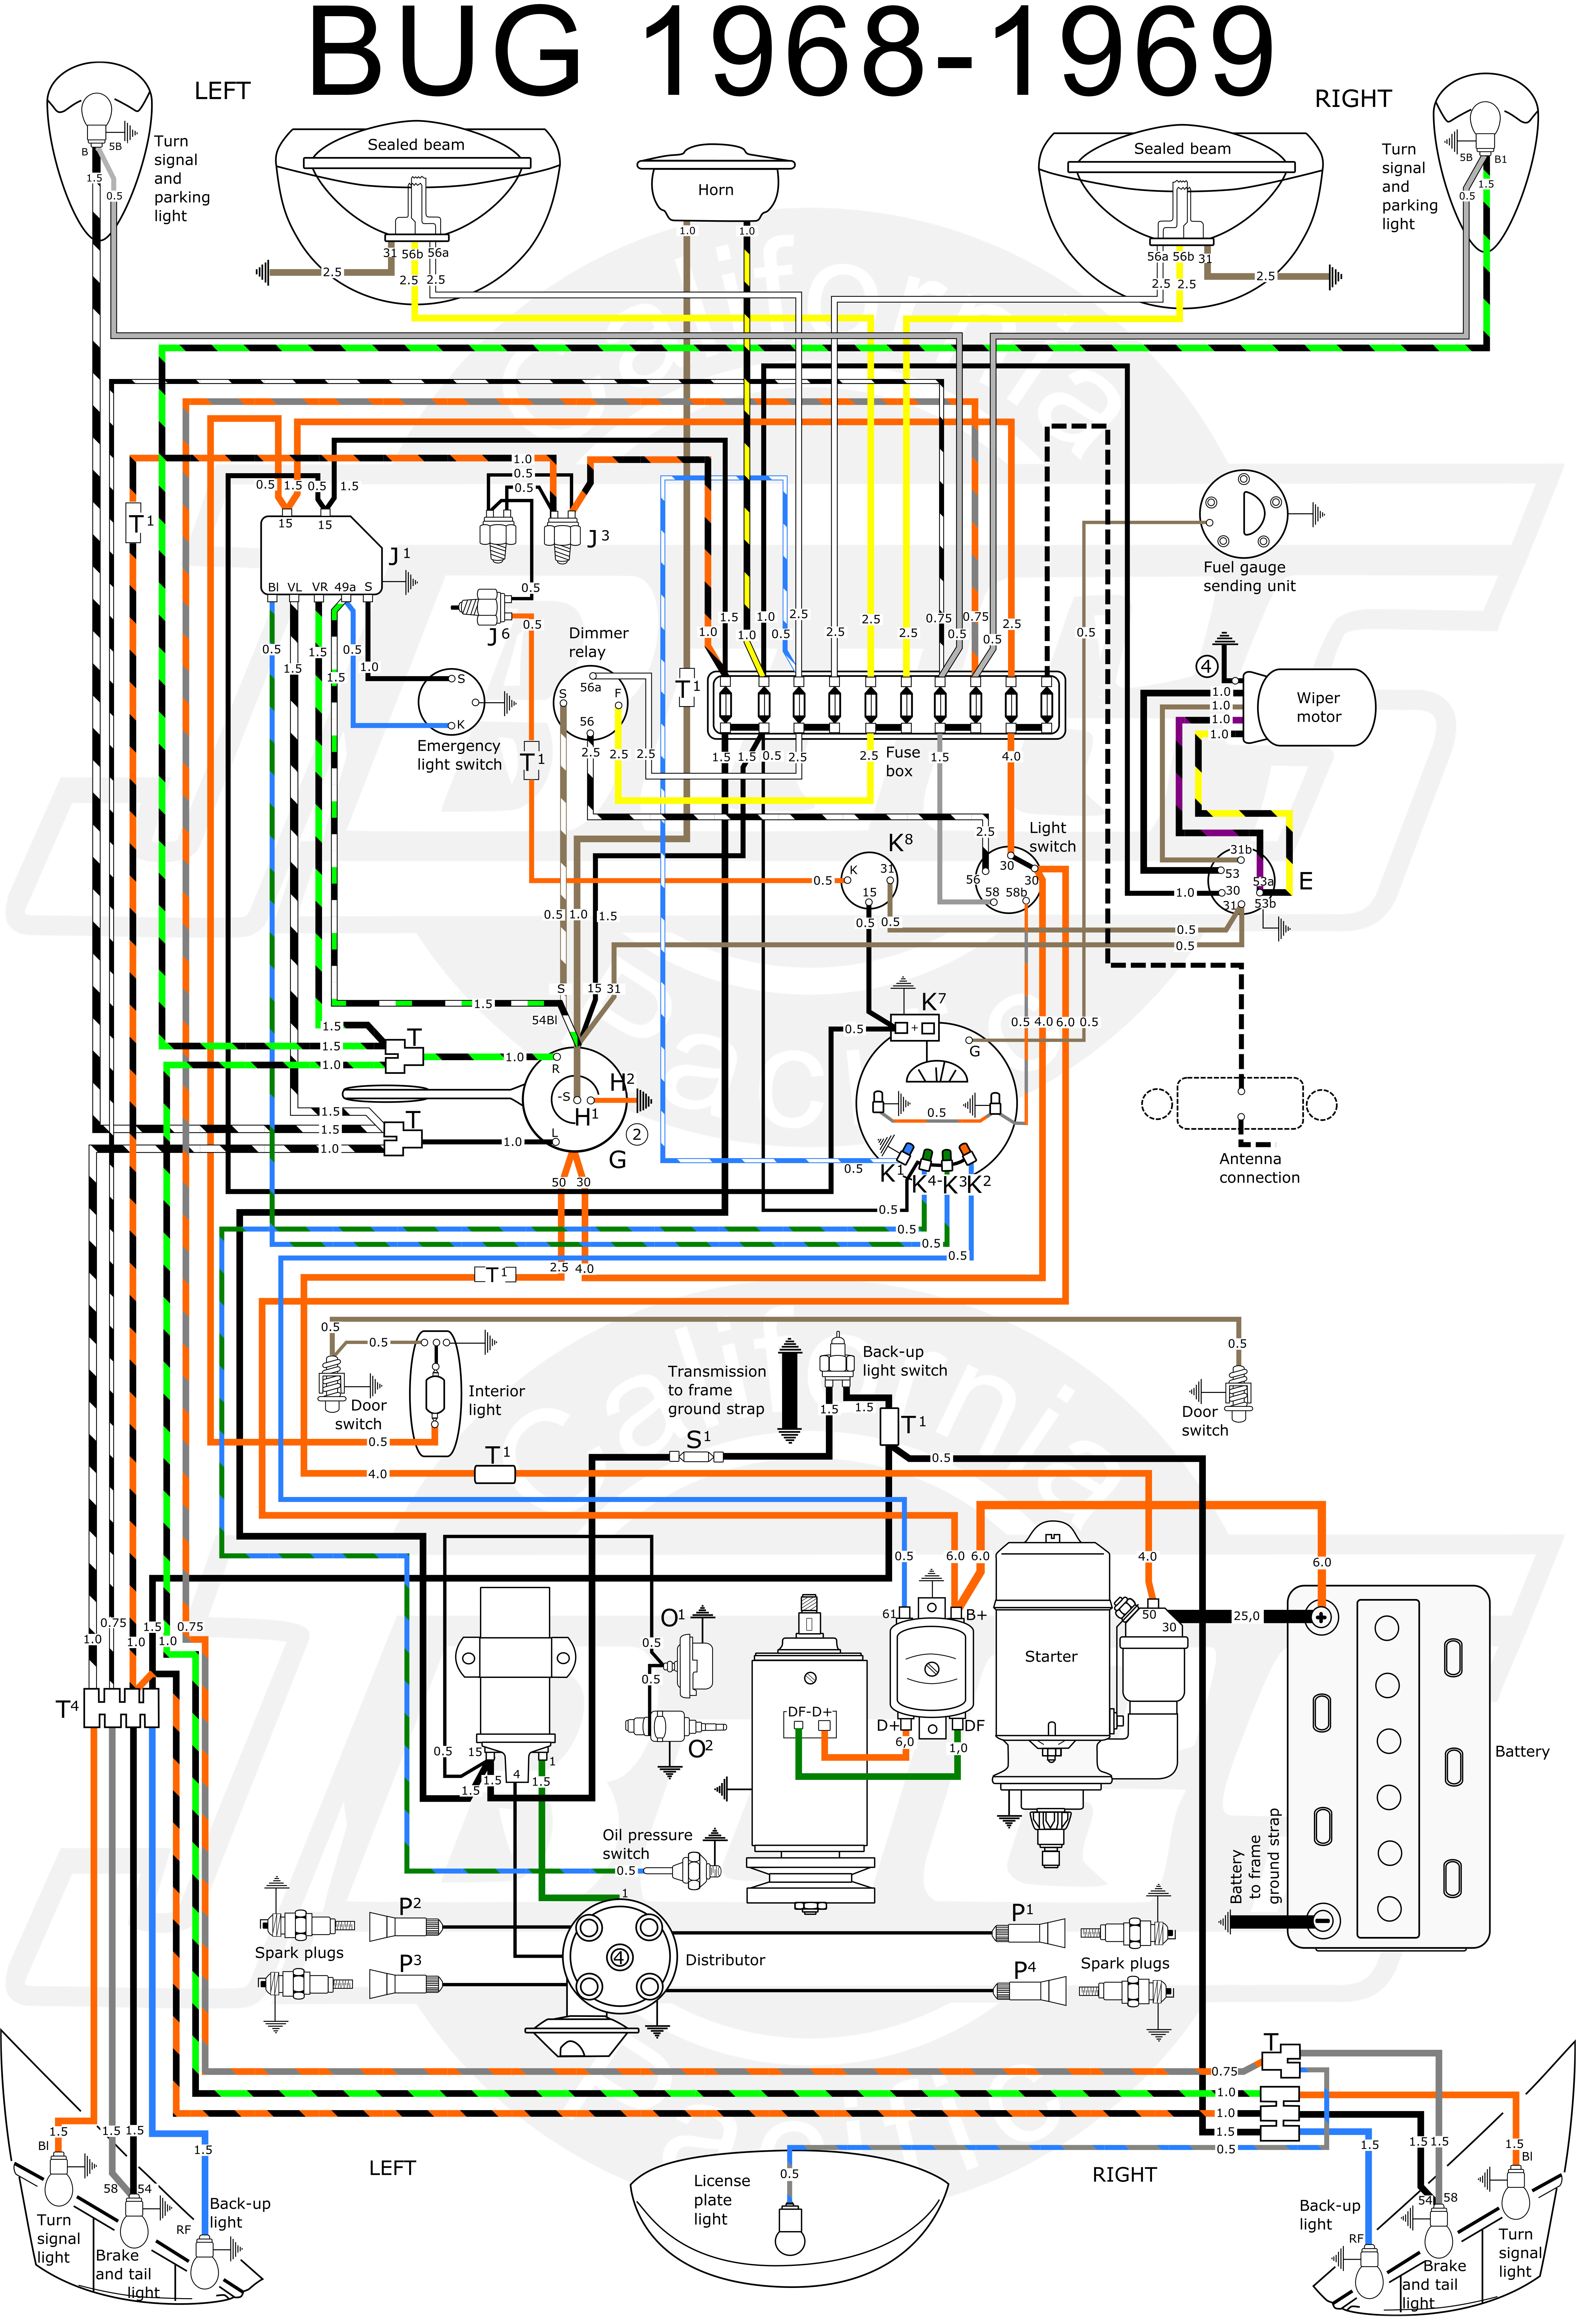 [DIAGRAM_1JK]  FL_4246] Gmc 2500 Ke Wiring Diagram   76 Gmc Tail Light Wiring      Inki Alypt Impa Bios Oxyl Majo Norab Dylit Mepta Mohammedshrine Librar  Wiring 101